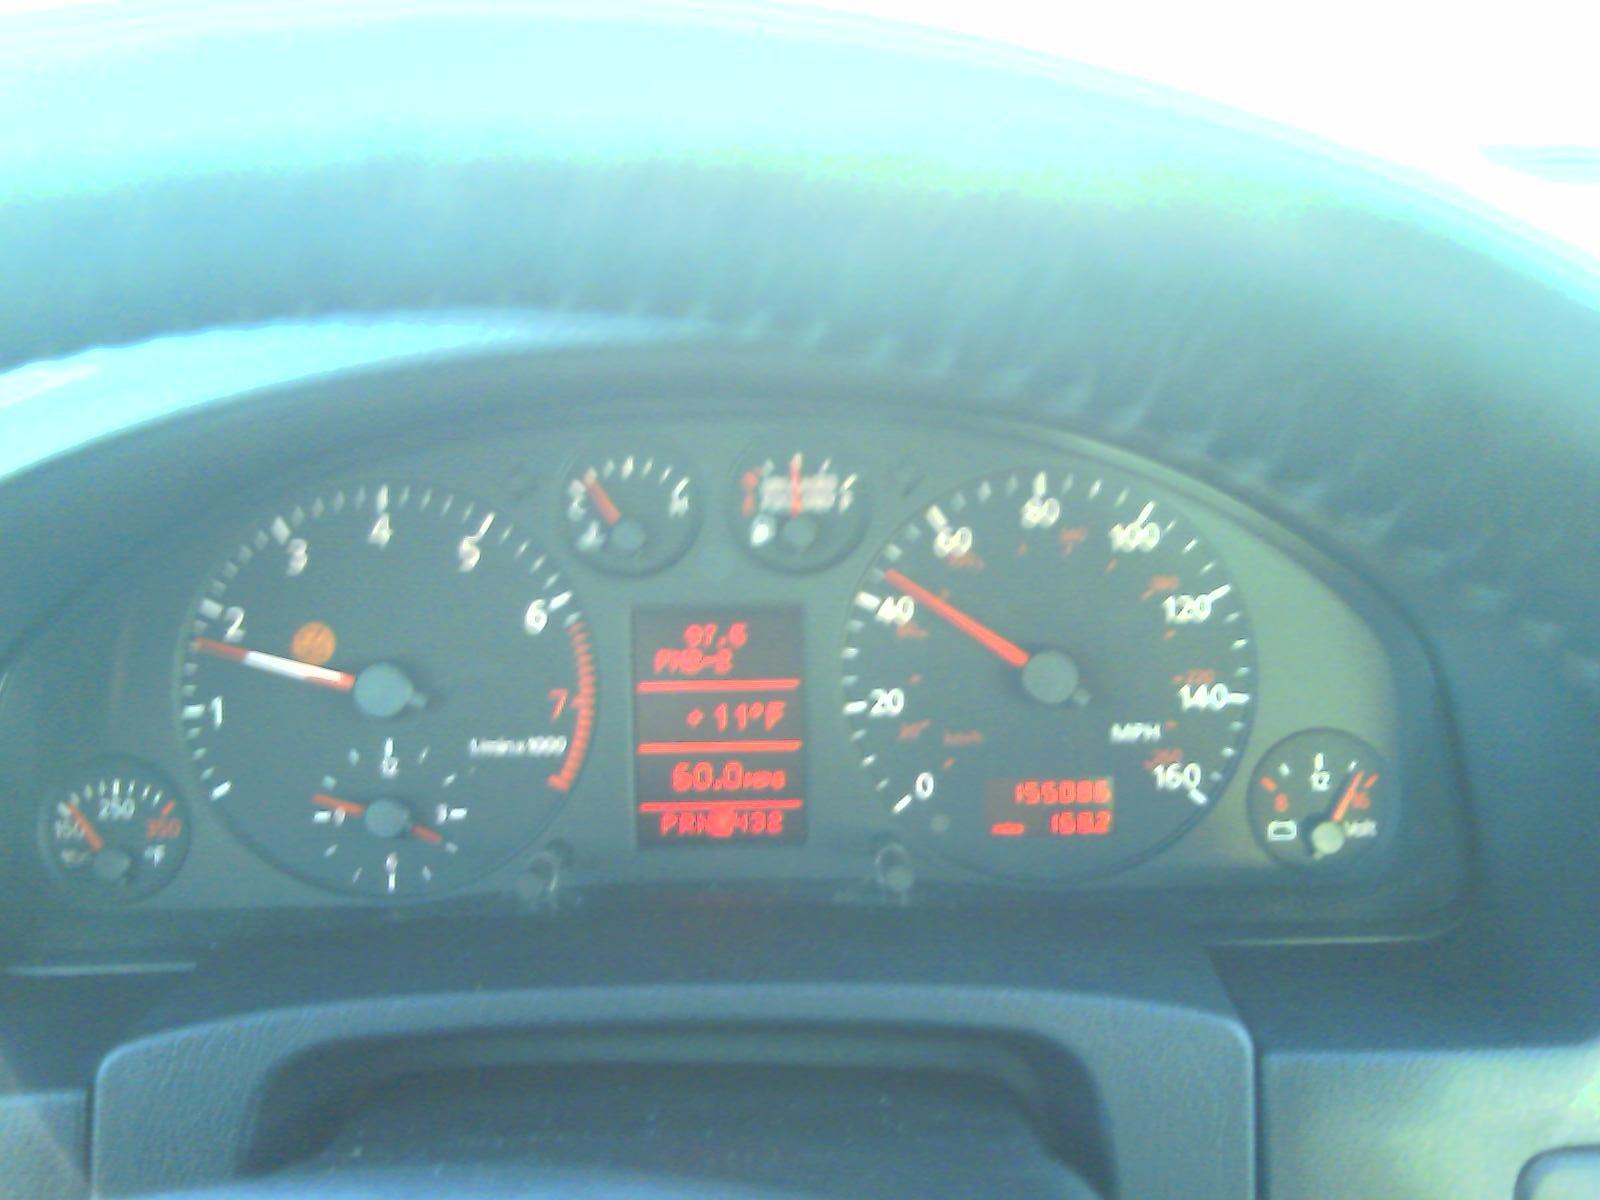 coolant sensor not moving, check engine light on - Audi Forums